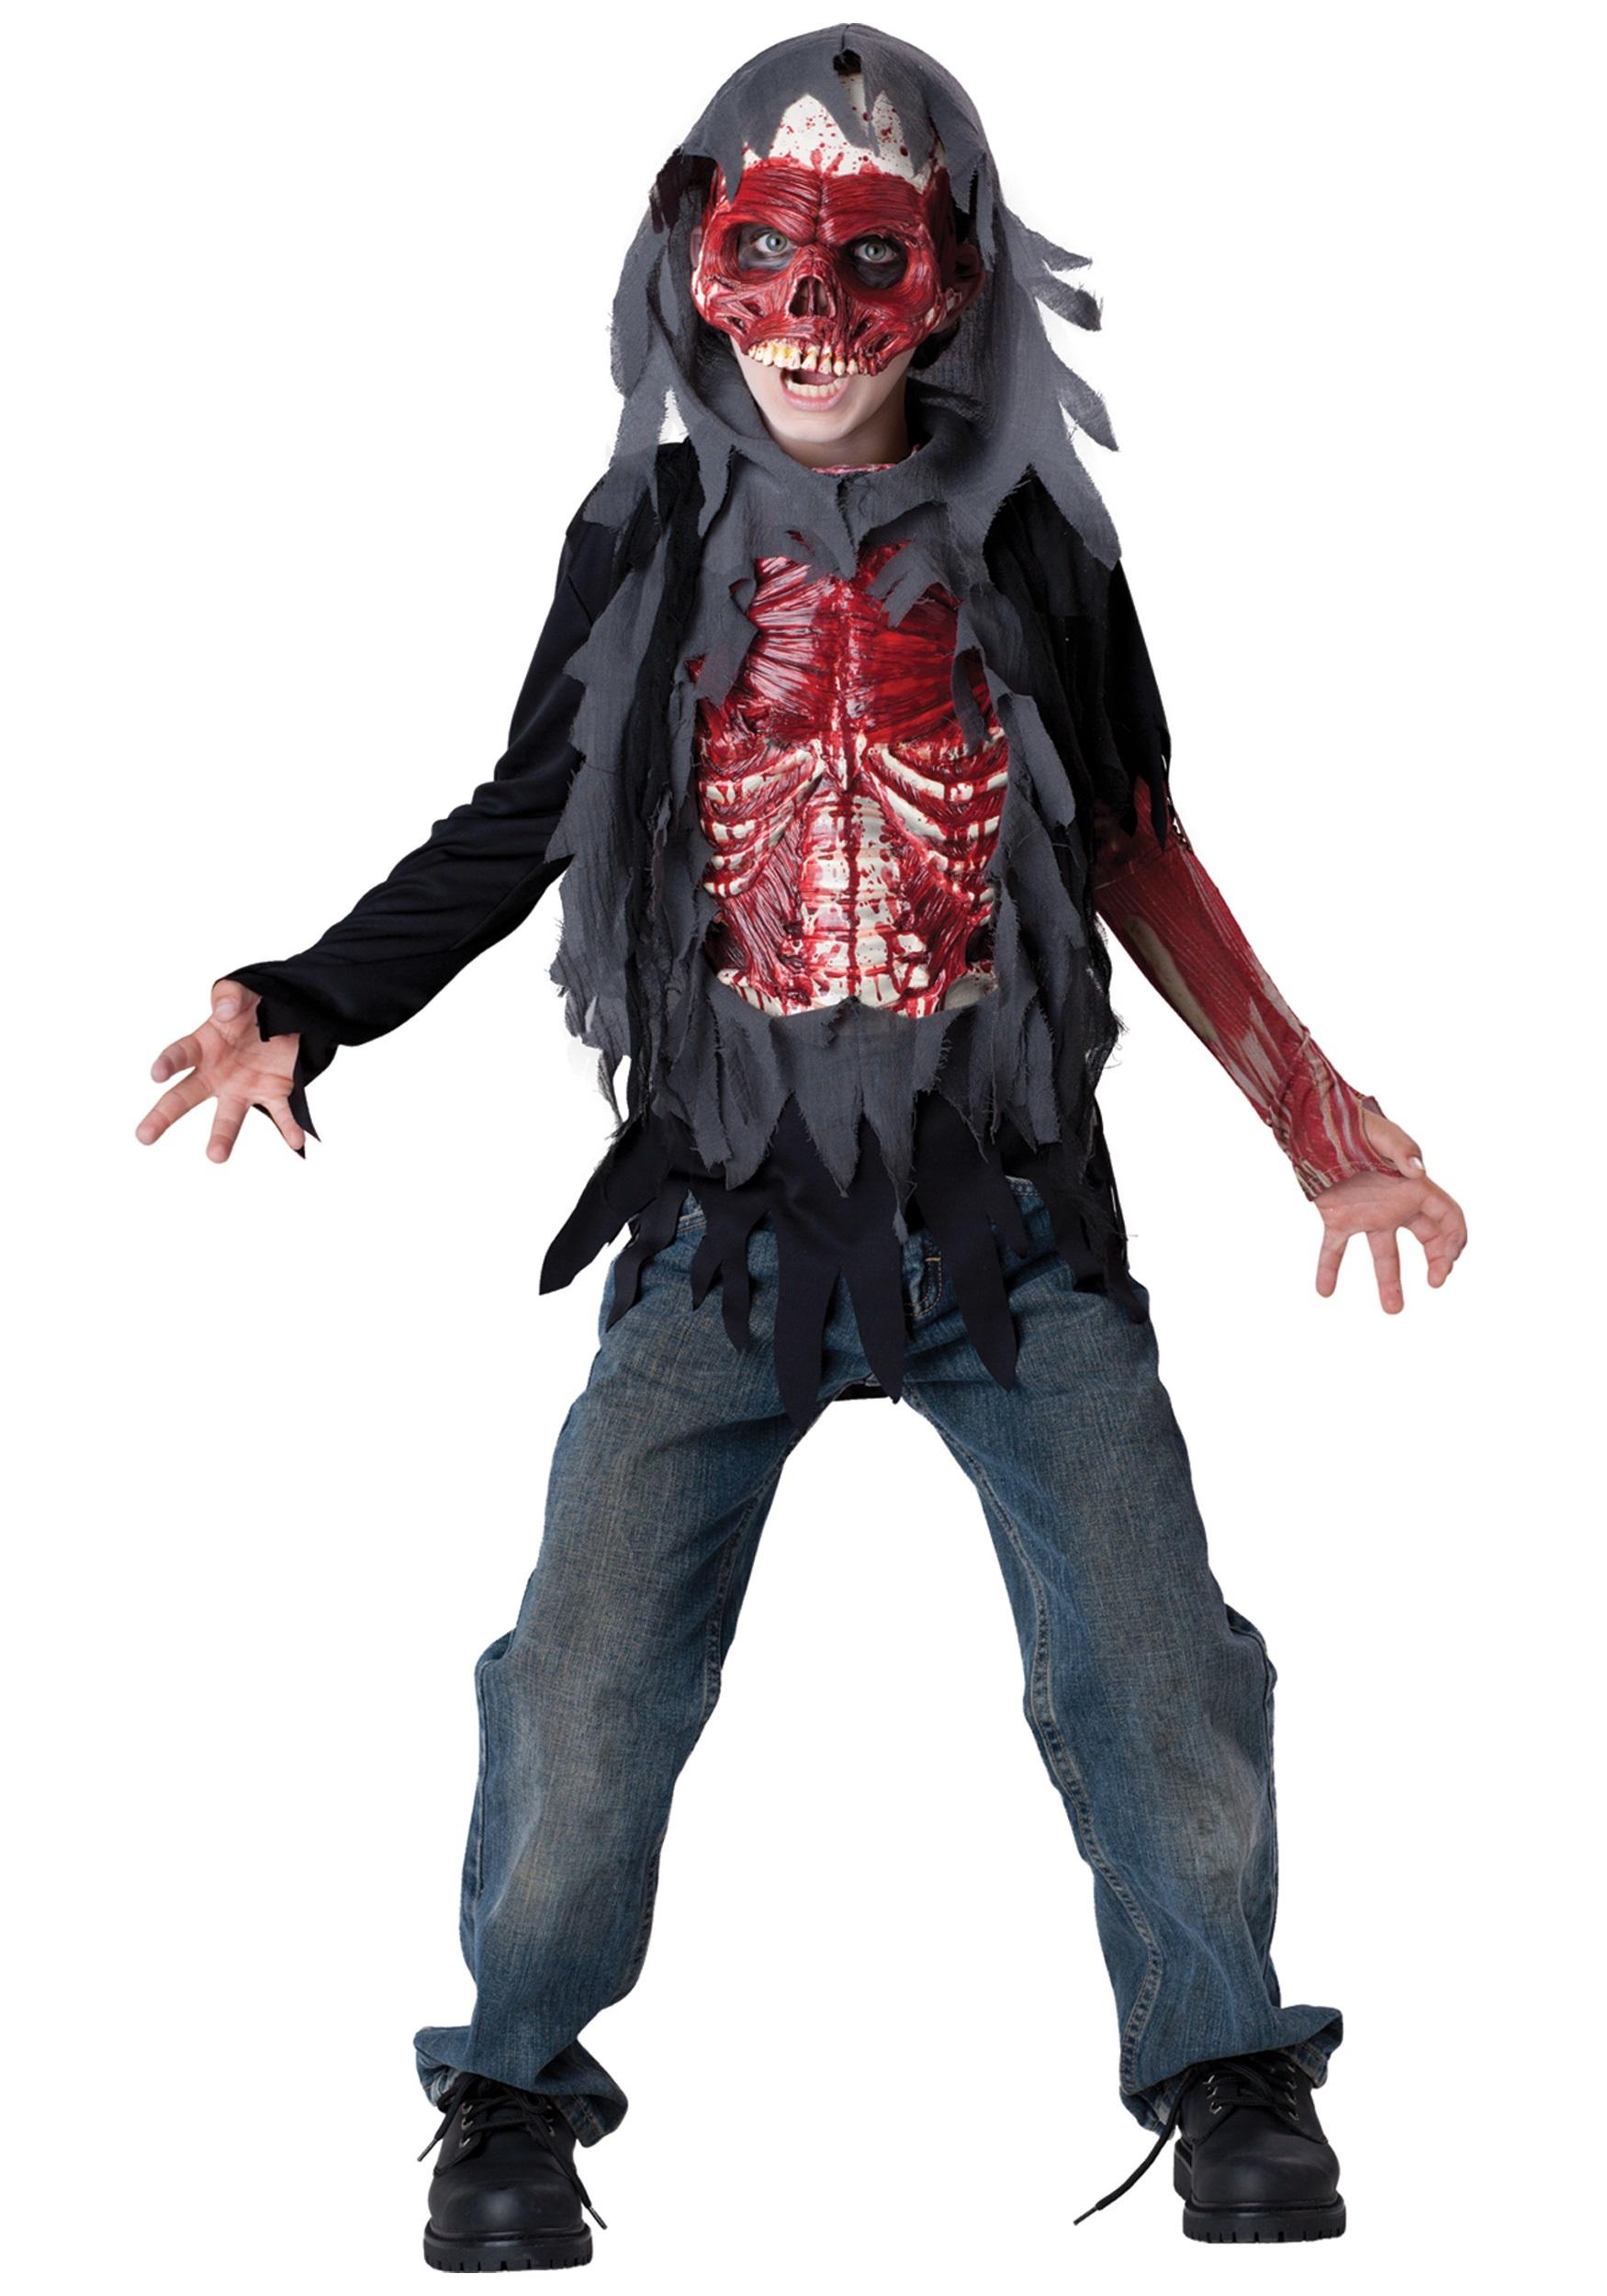 Костюм на хэллоуин для мальчика своими руками для мальчика